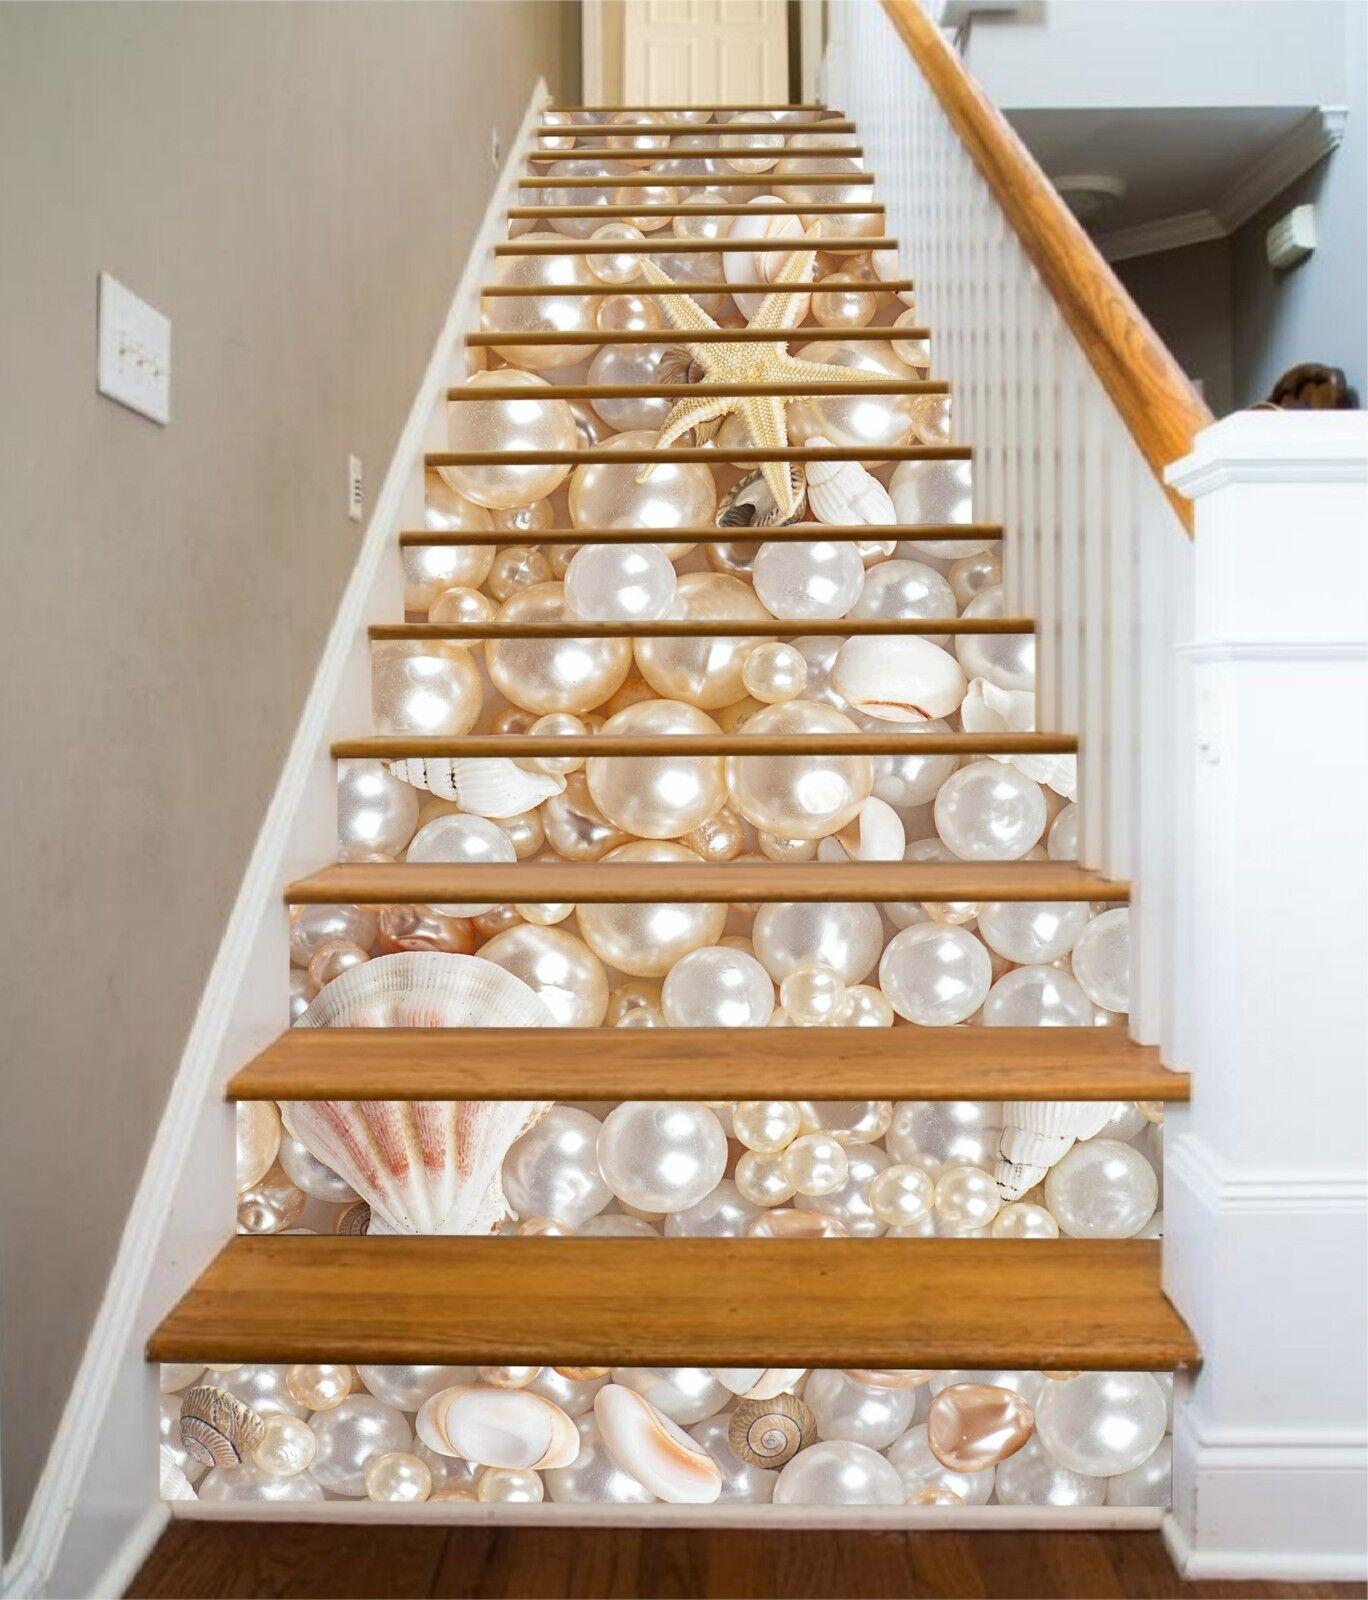 3D Pearl Pattern Stair Risers Decoration Photo Mural Vinyl Decal Wallpaper CA